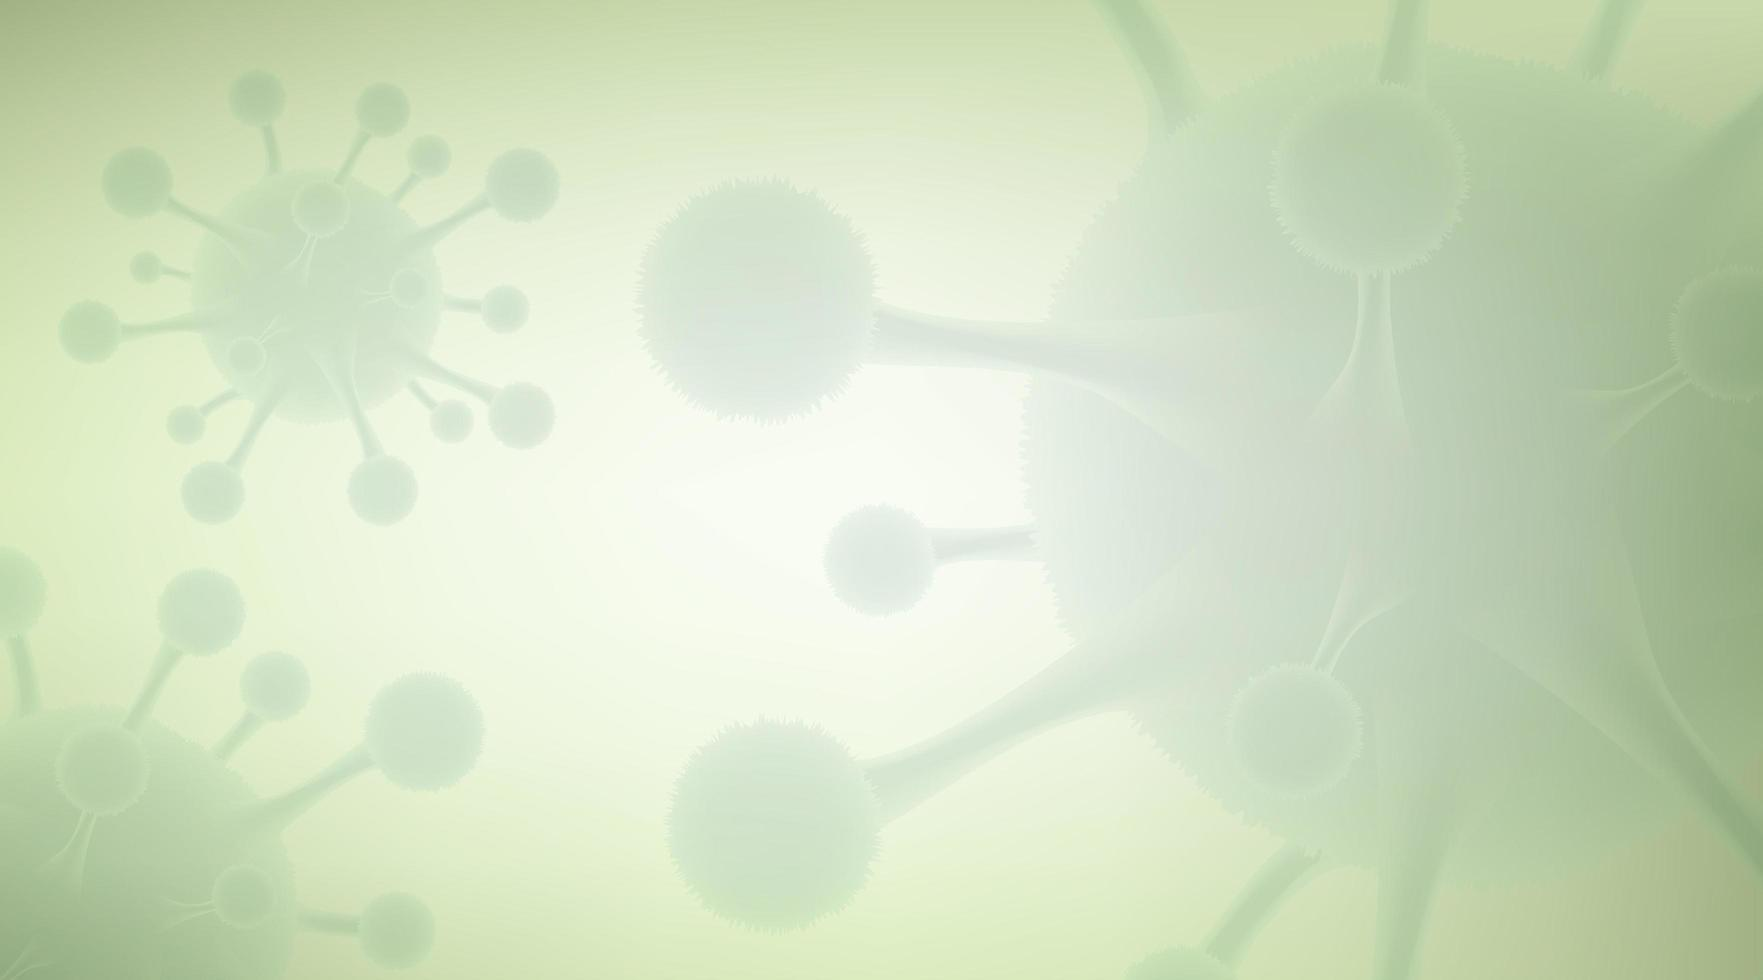 projeto blur coronavirus 2019-ncov vetor